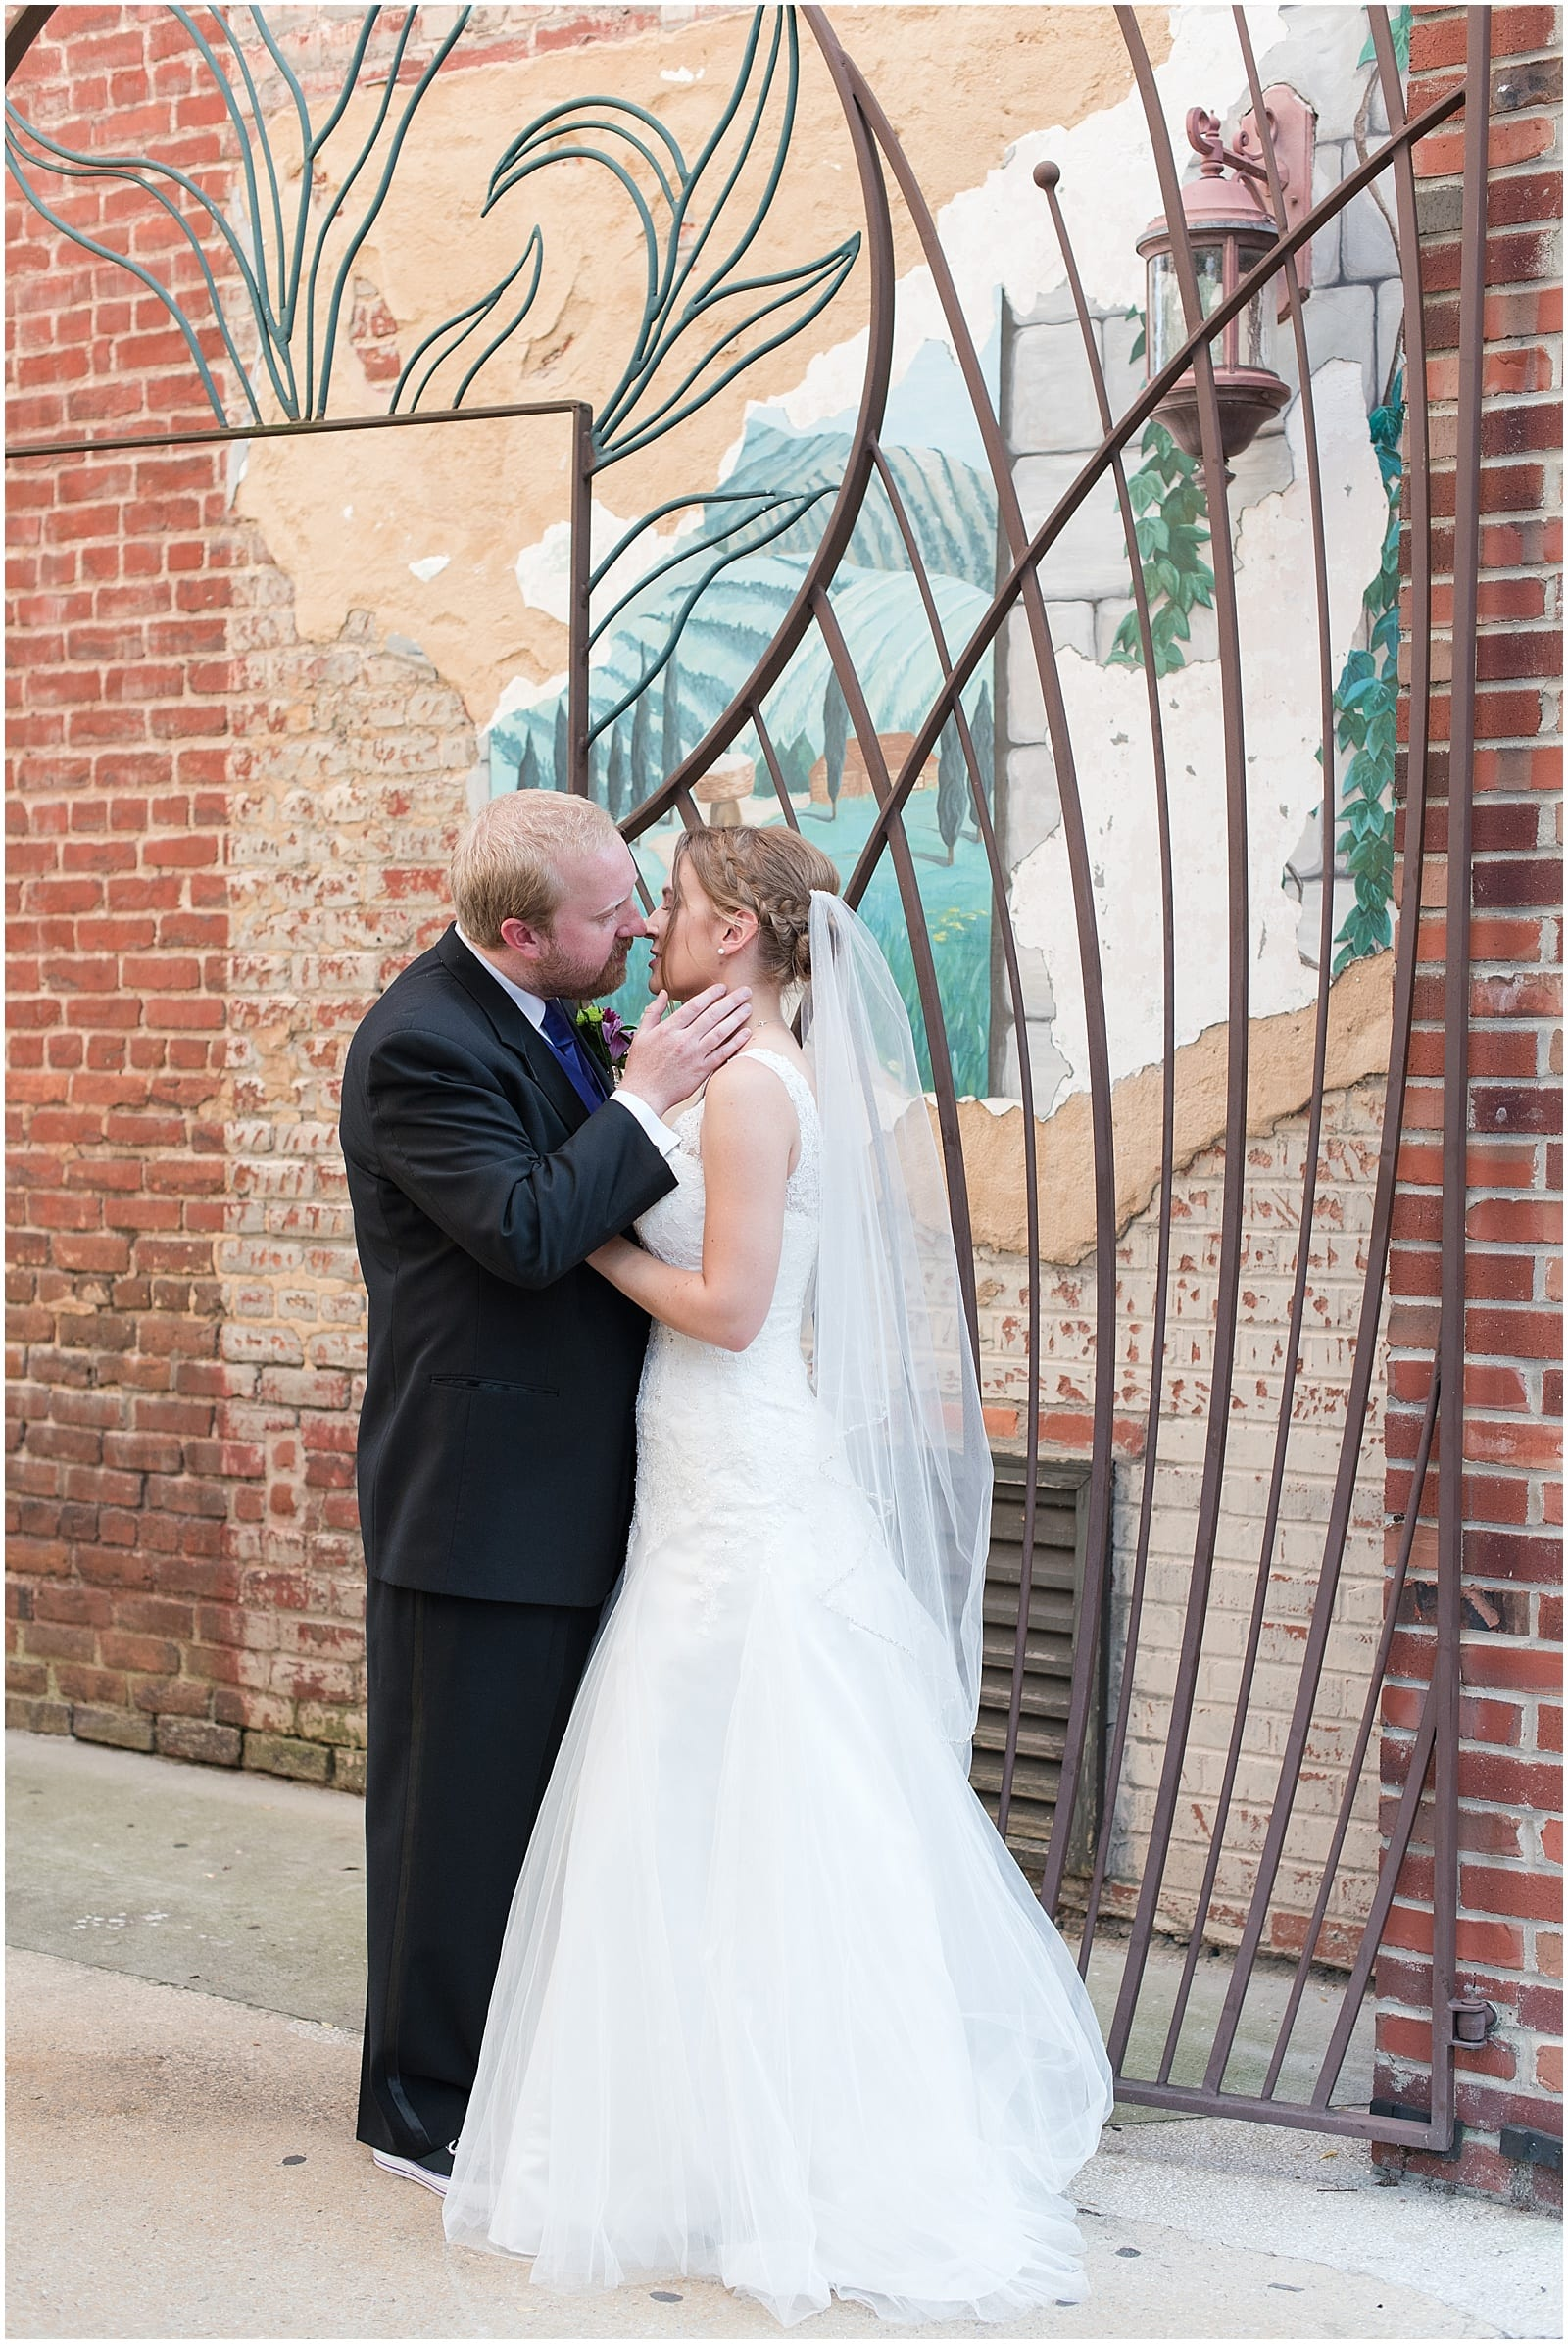 A Classy Mardi Gras Wedding At Suite 300 at Kress Terrace NC Wedding Photography